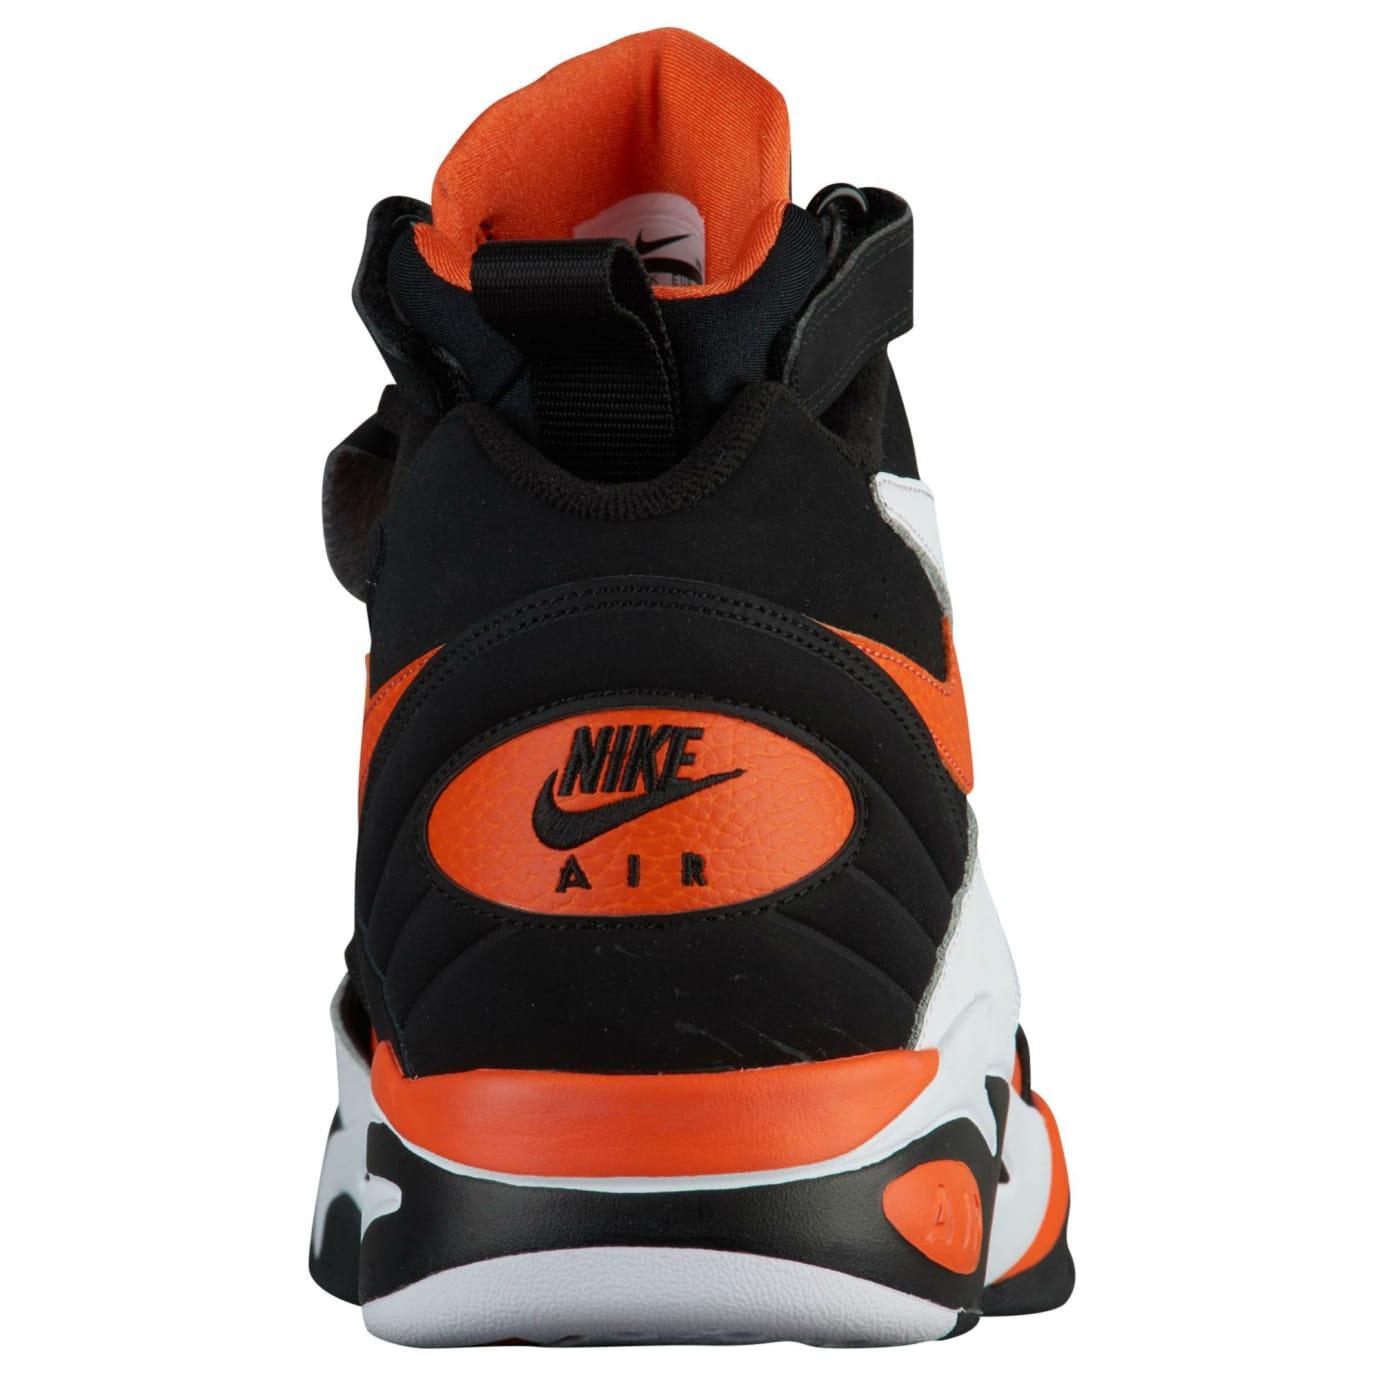 Nike Air Maestro 2 LTD Rush Orange Release Date AH8511-101 Heel